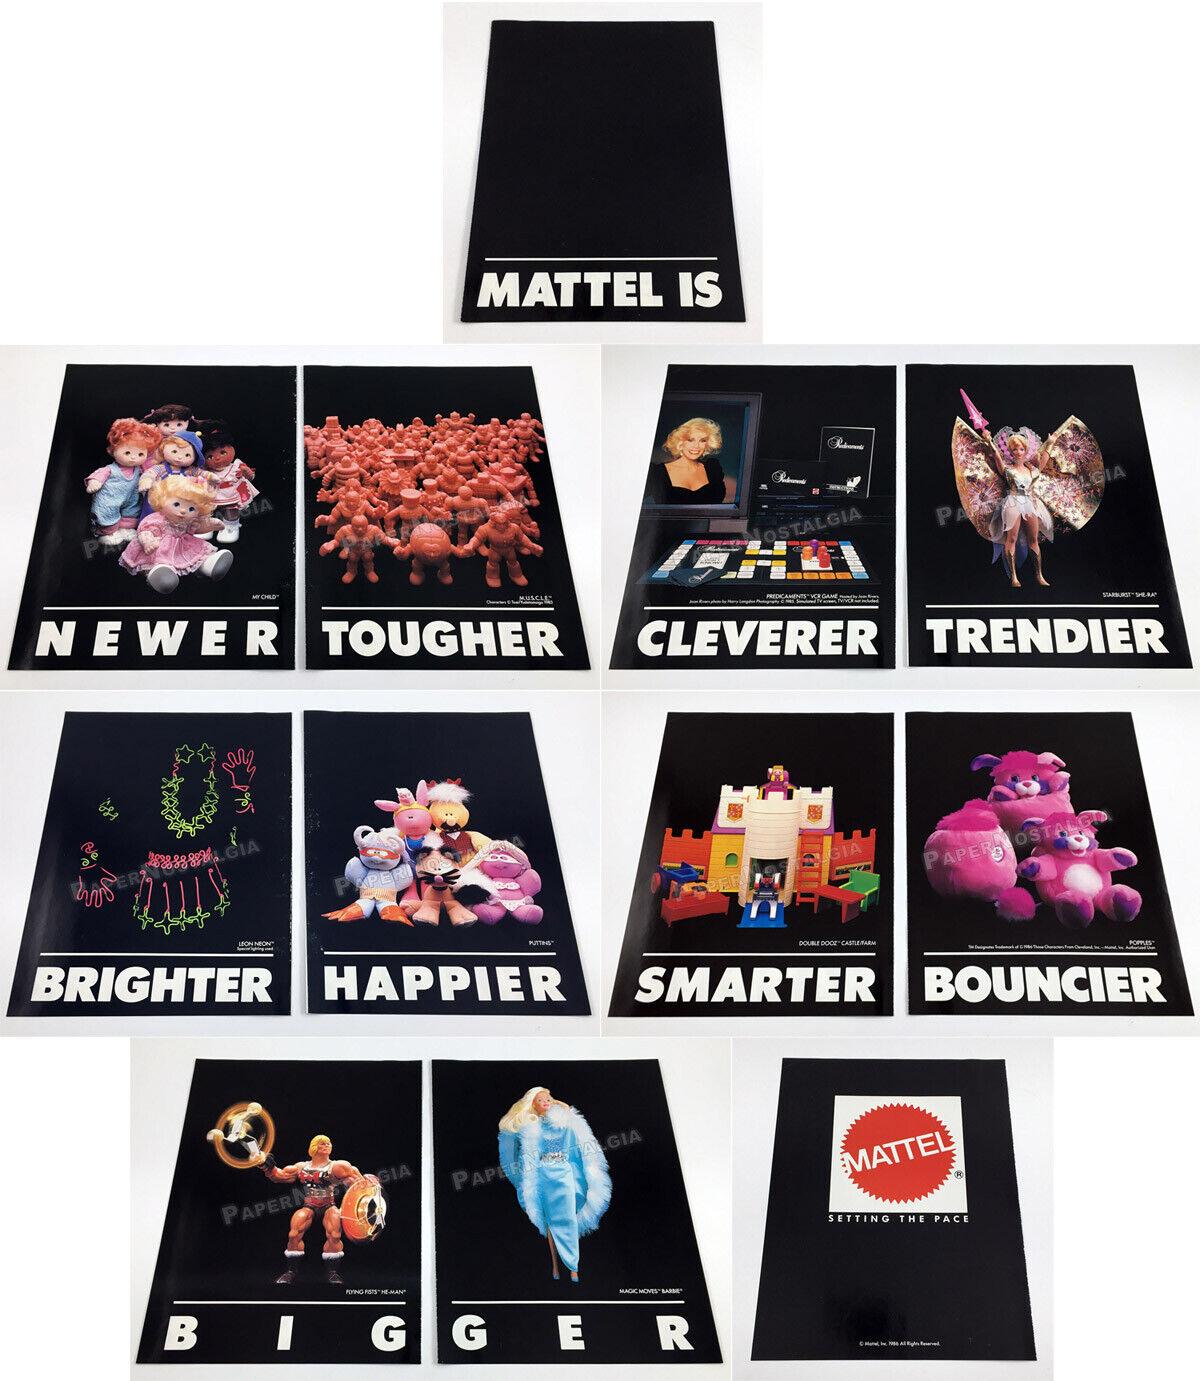 MATTEL__Orig 1986 Trade promo__HE-MAN_Sternburst She-Ra_MUSCLE_Magic Moves Barbie